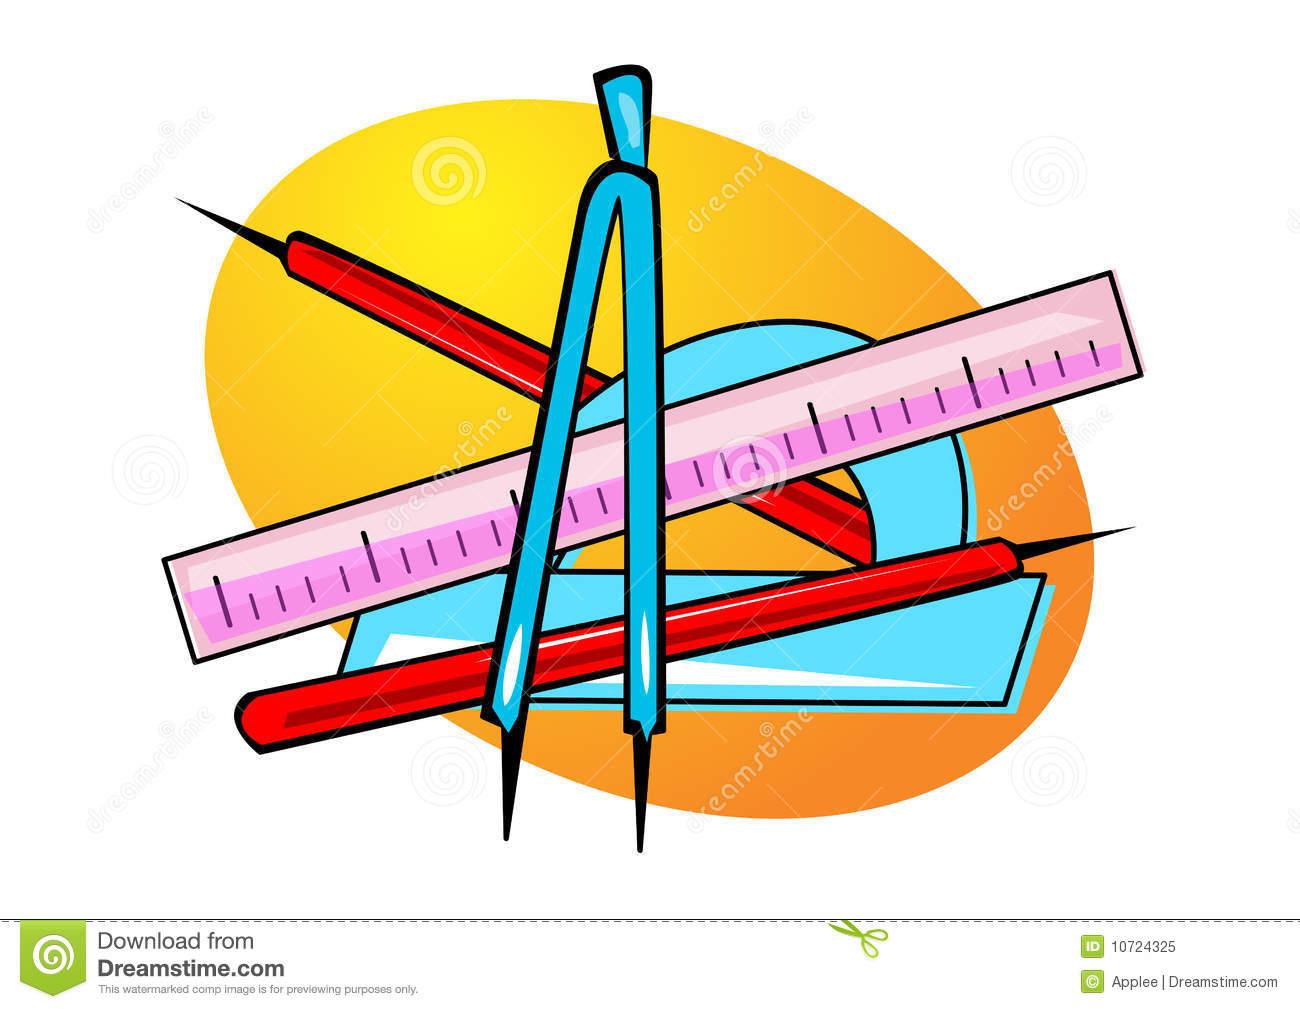 Geometry clipart Geometry  Clipart Geometry Art